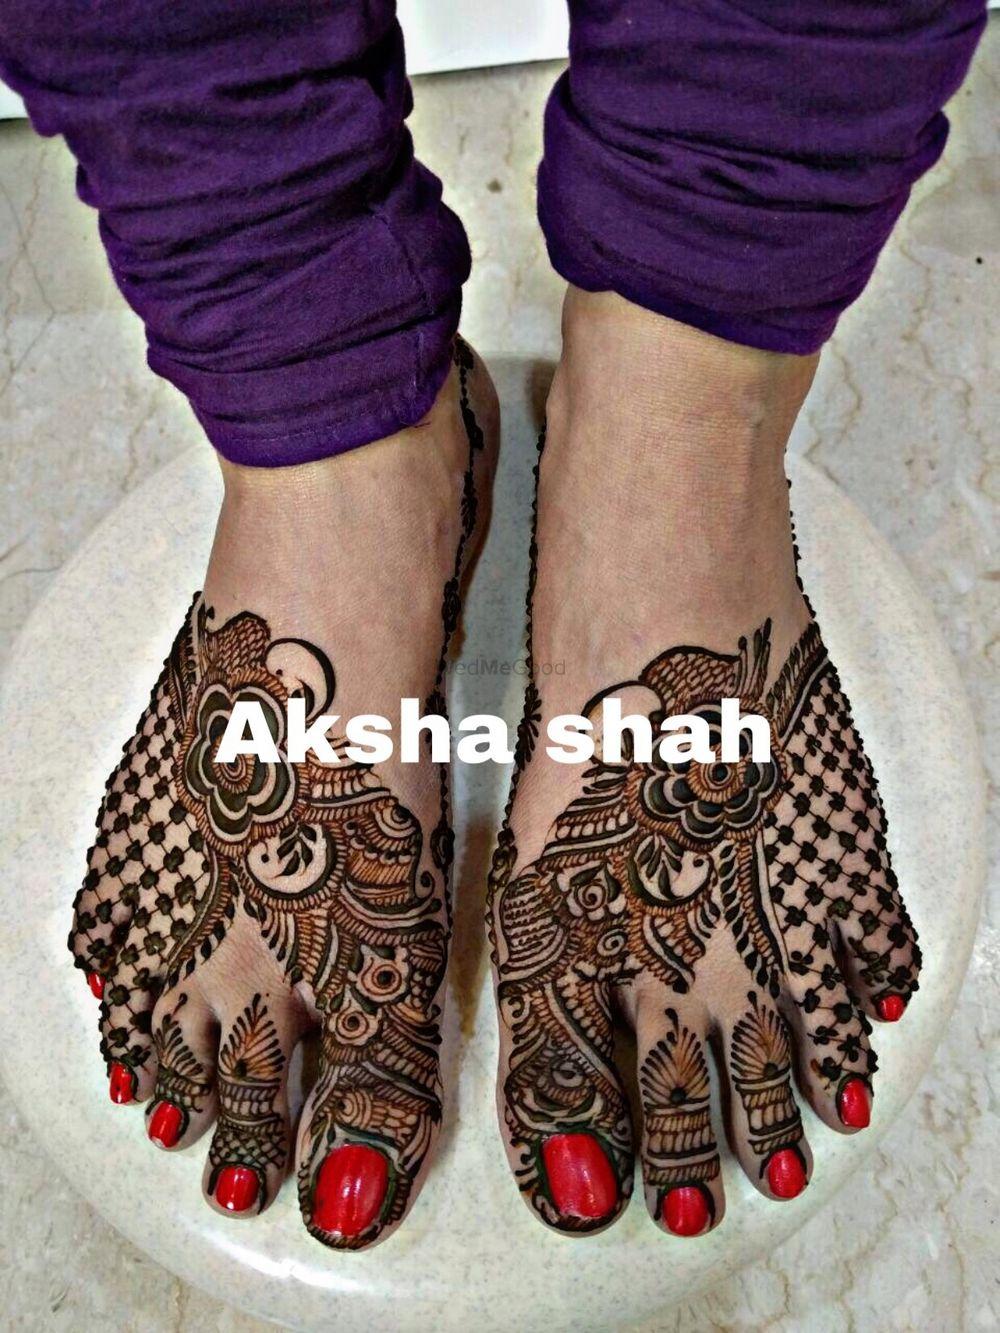 Photo From latest designer concepts - By Aksha Shah Mehendi Designer